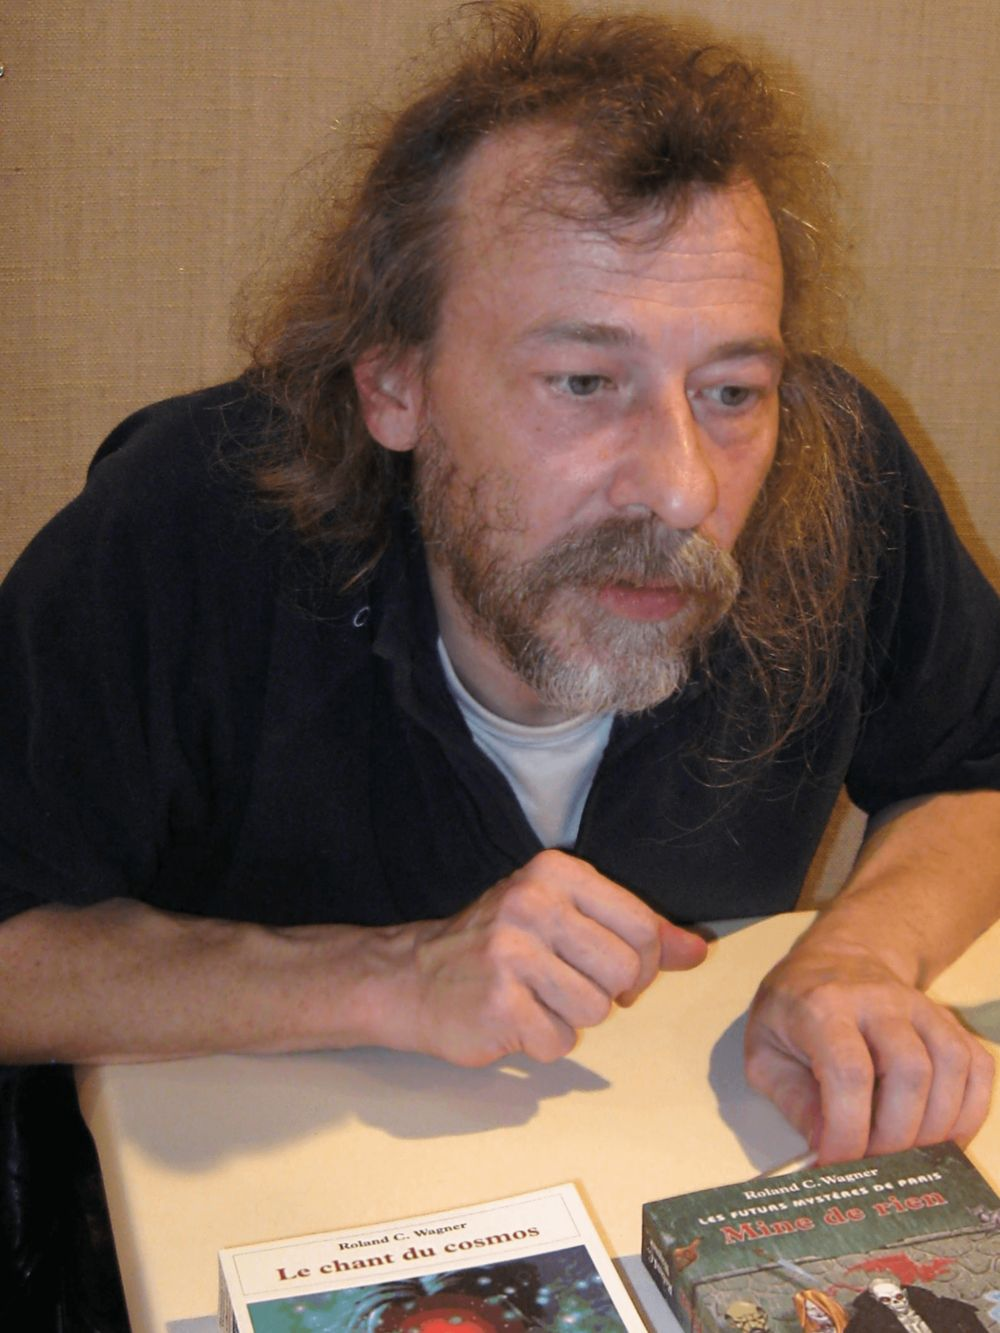 Roland C. Wagner